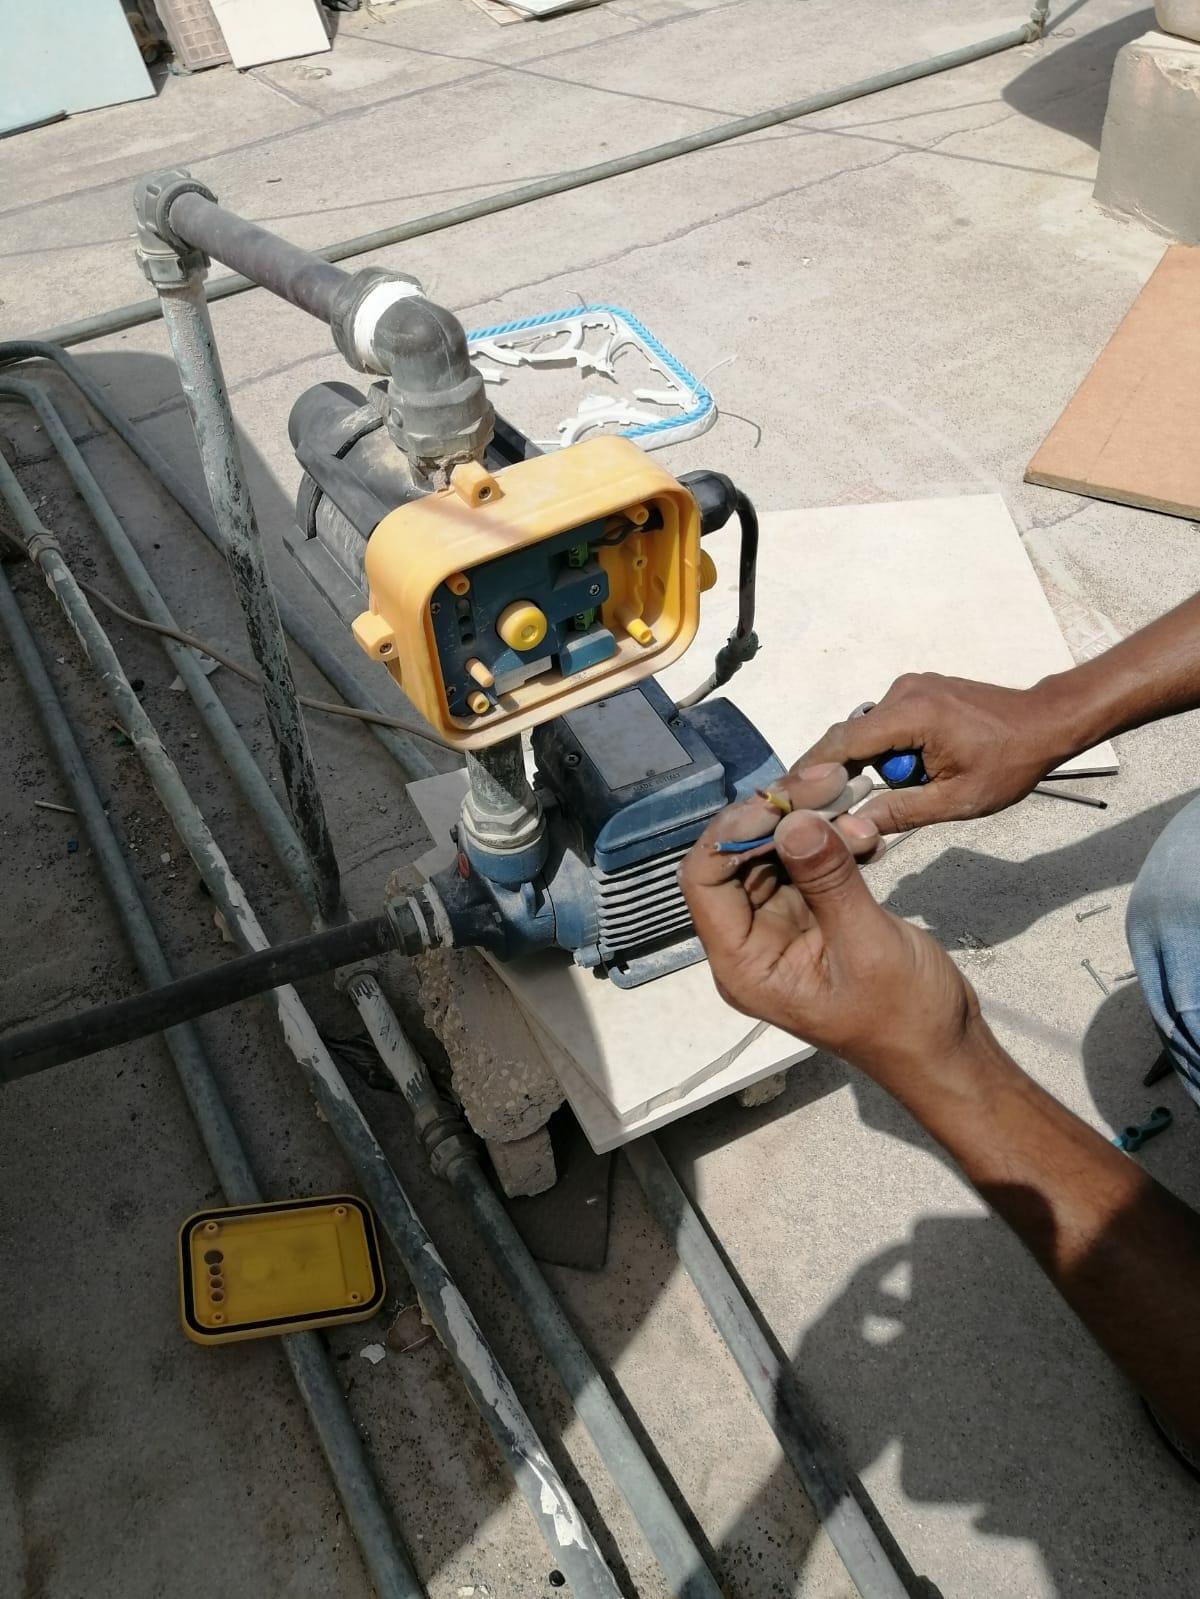 Best Plumbing Services Company in Doha Qatar 2021